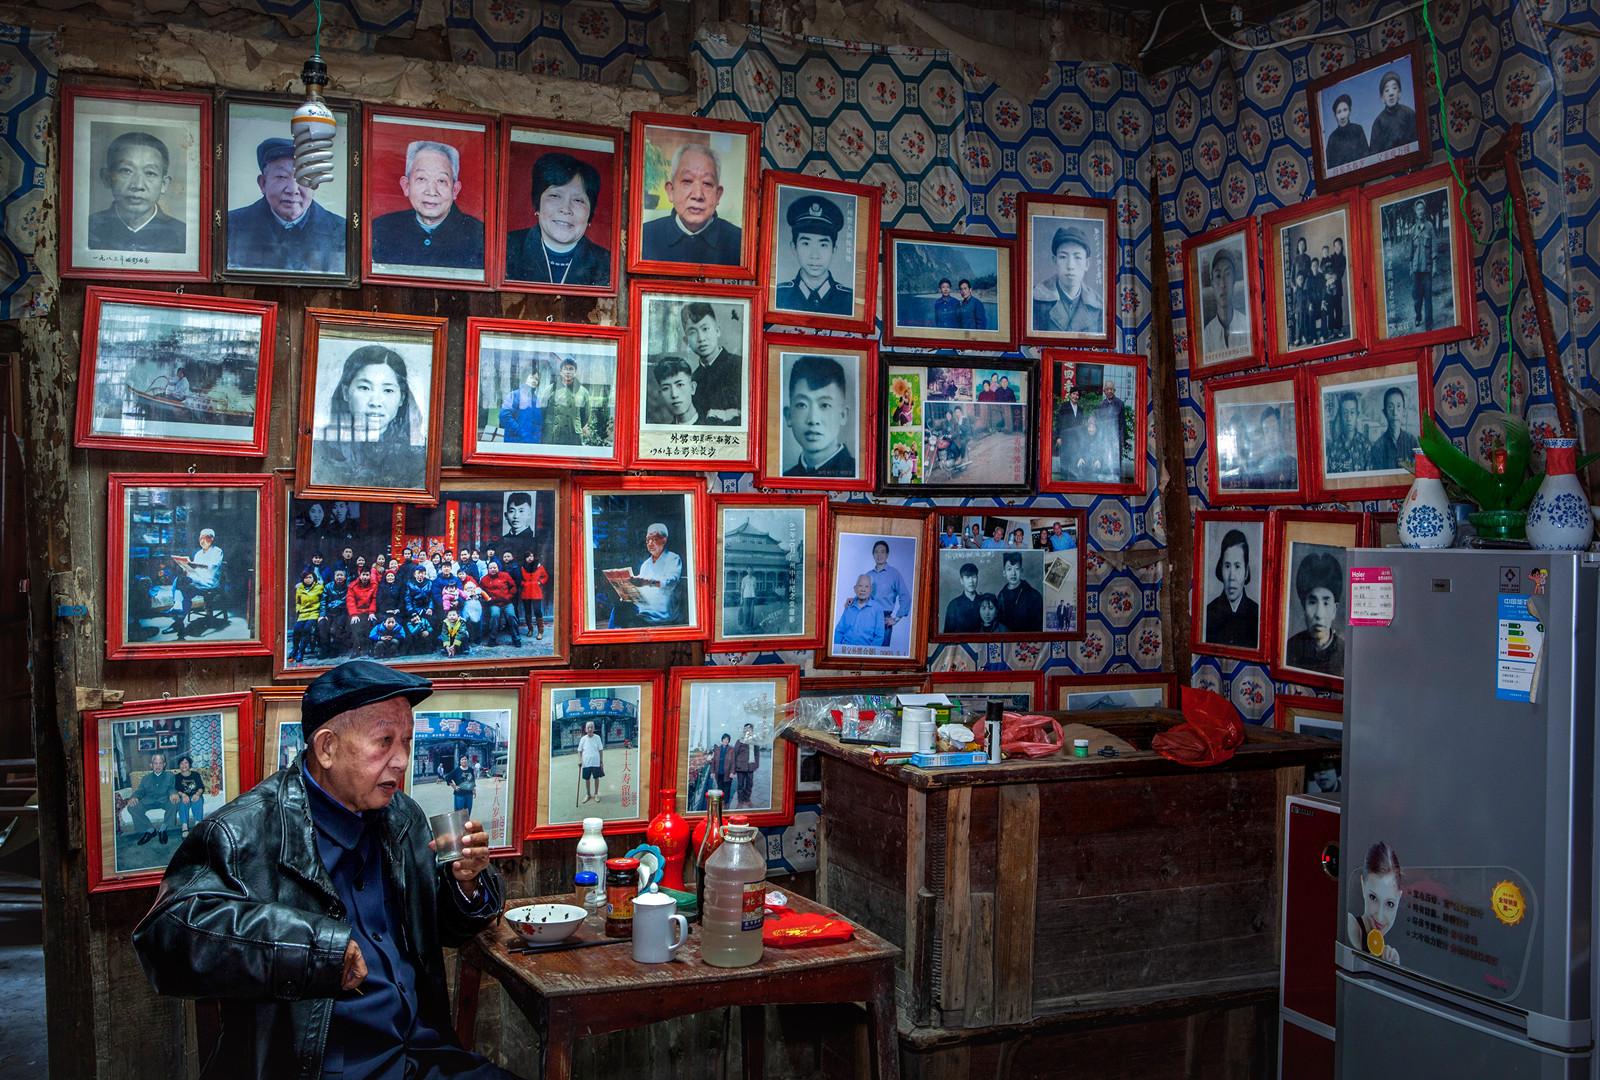 kuang-huimin-lost-dreams-in-tuokou-photography-of-china-10.jpg